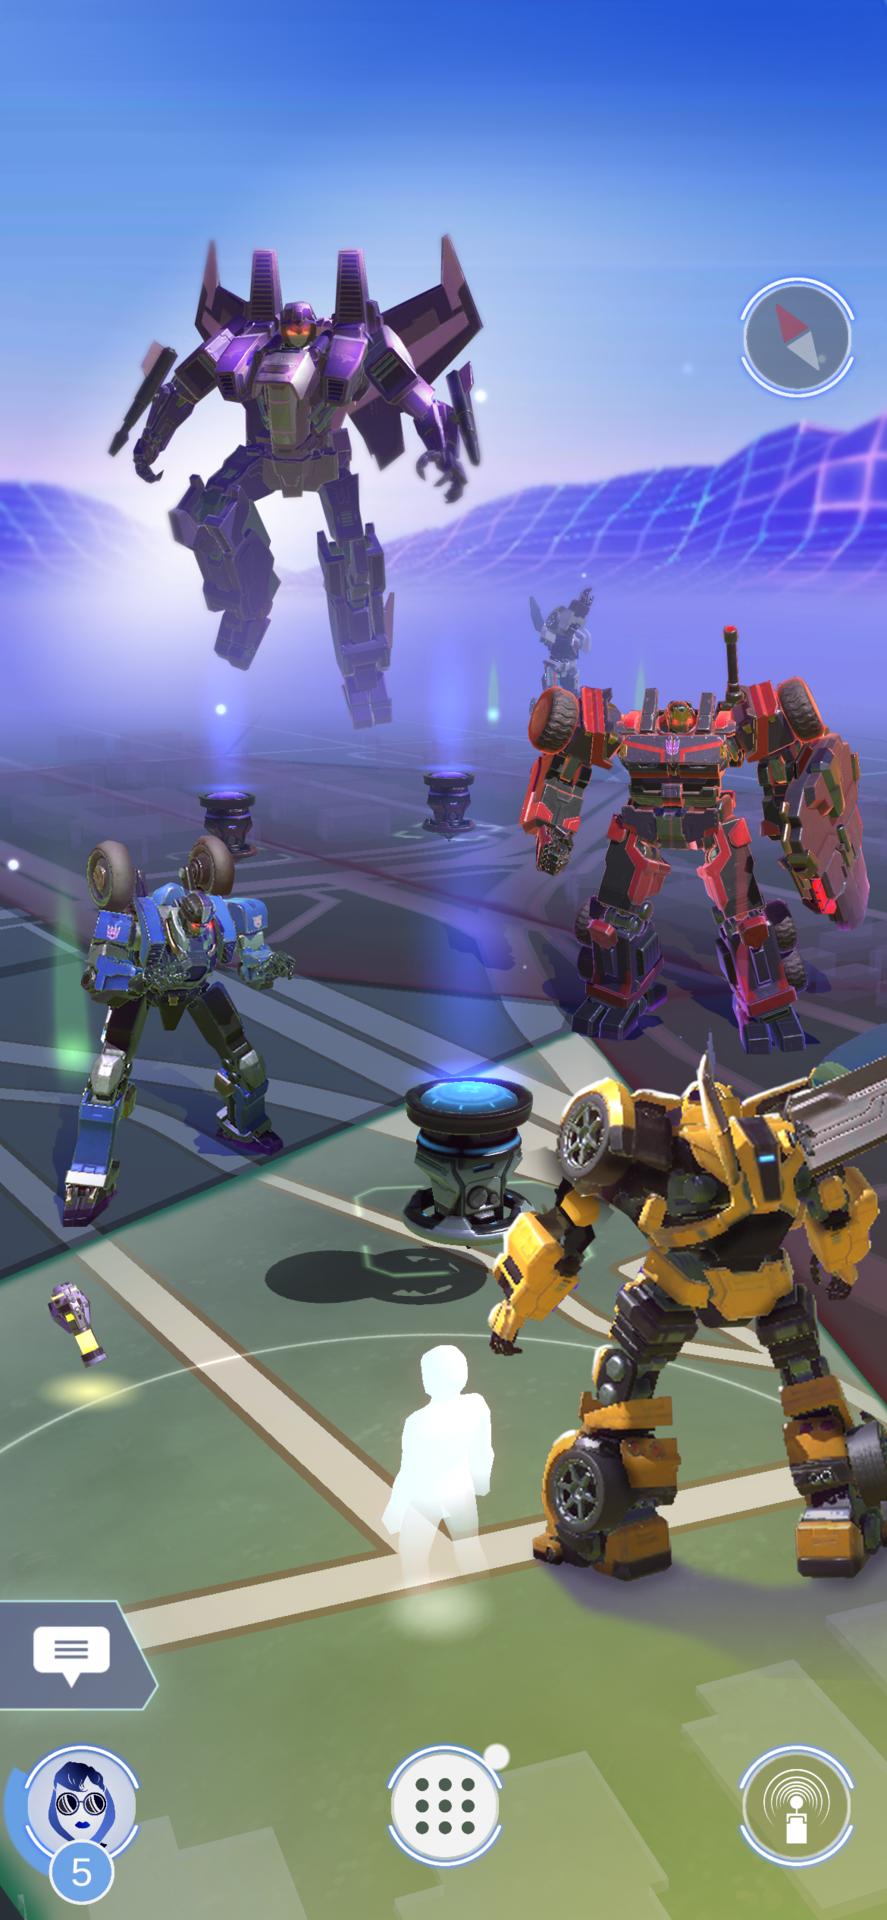 Transformers Heavy metal Screenshot 2